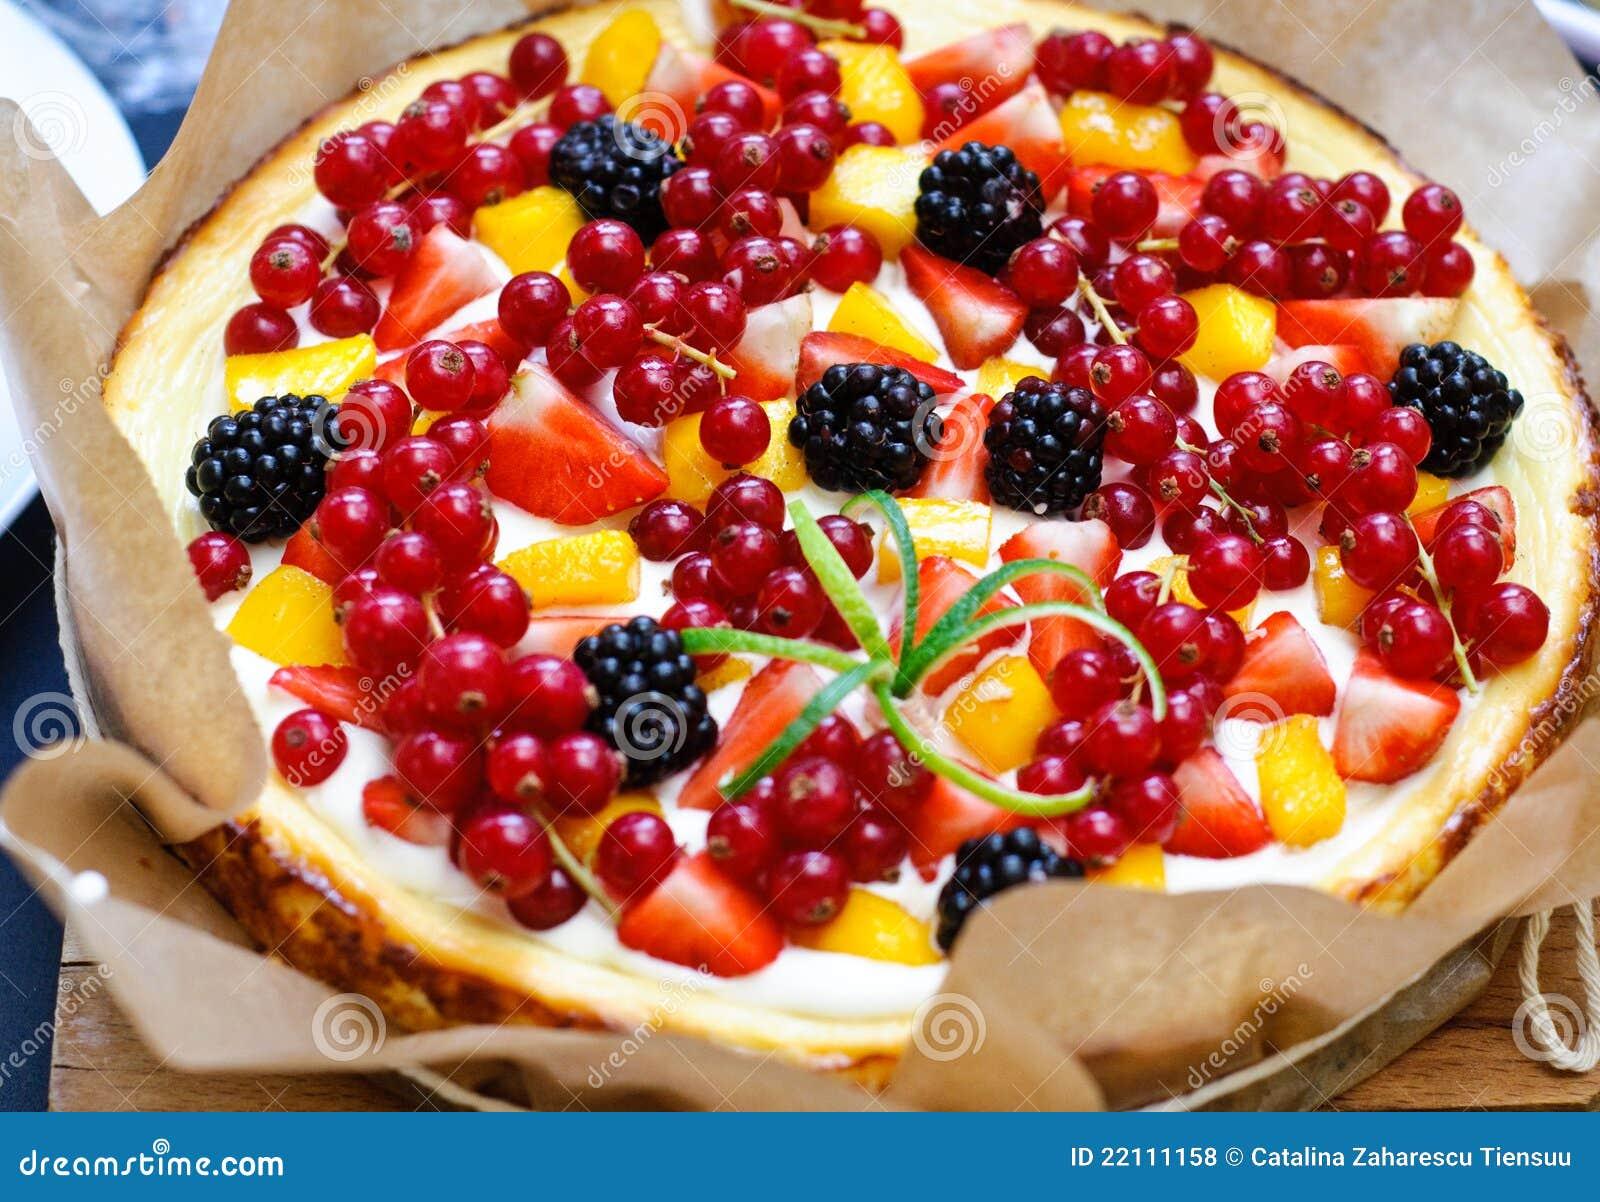 Frutifica o bolo de queijo da baunilha